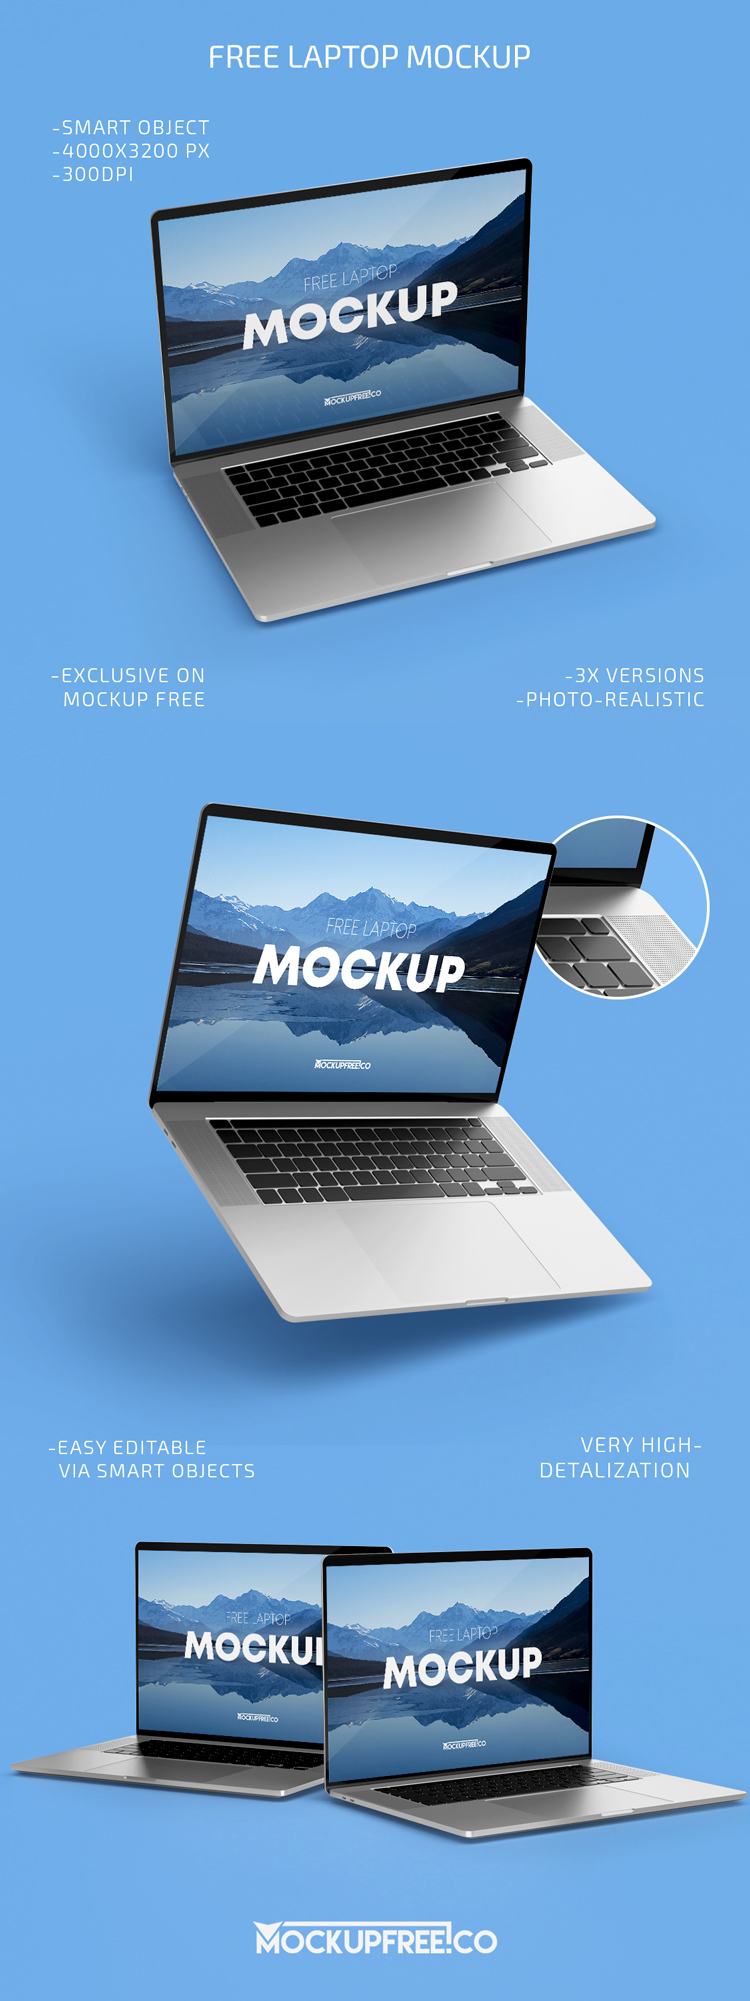 Free Laptop with Keyboard Mockup